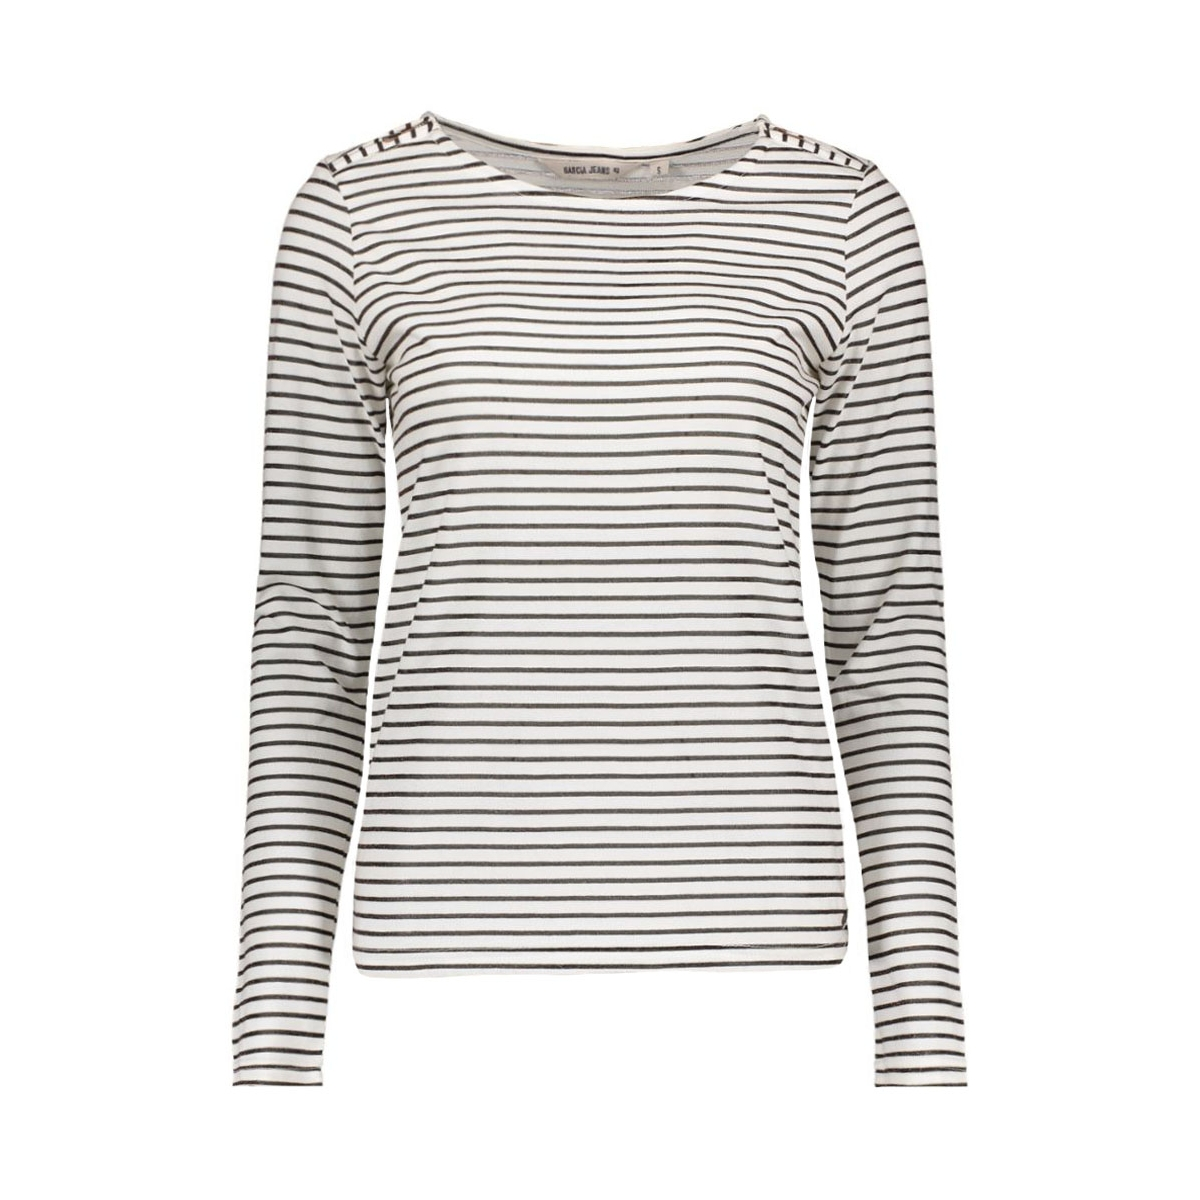 v60207 garcia t-shirt 950 shell